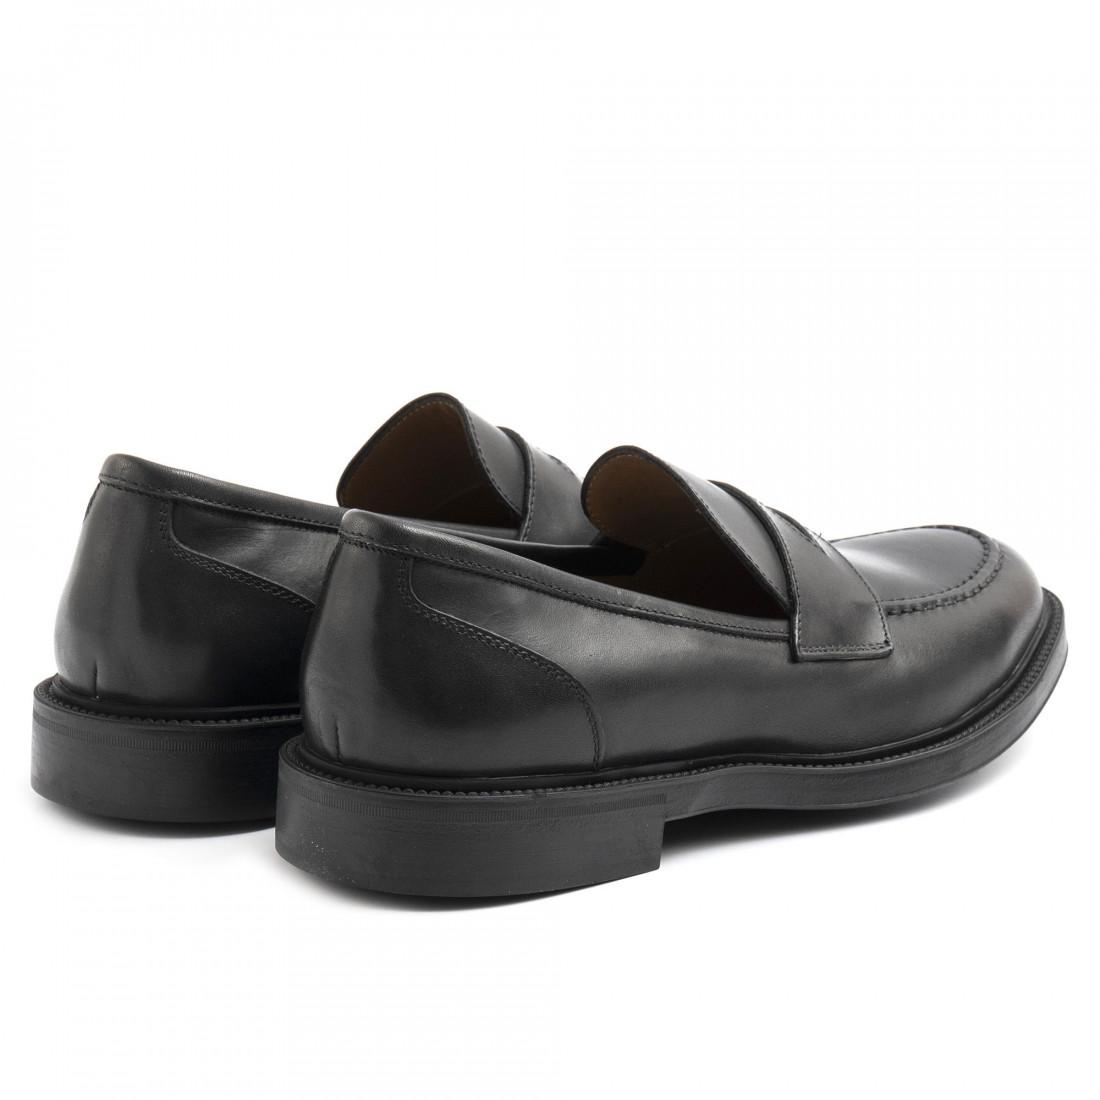 loafers man calpierre b2117bart nero 6400